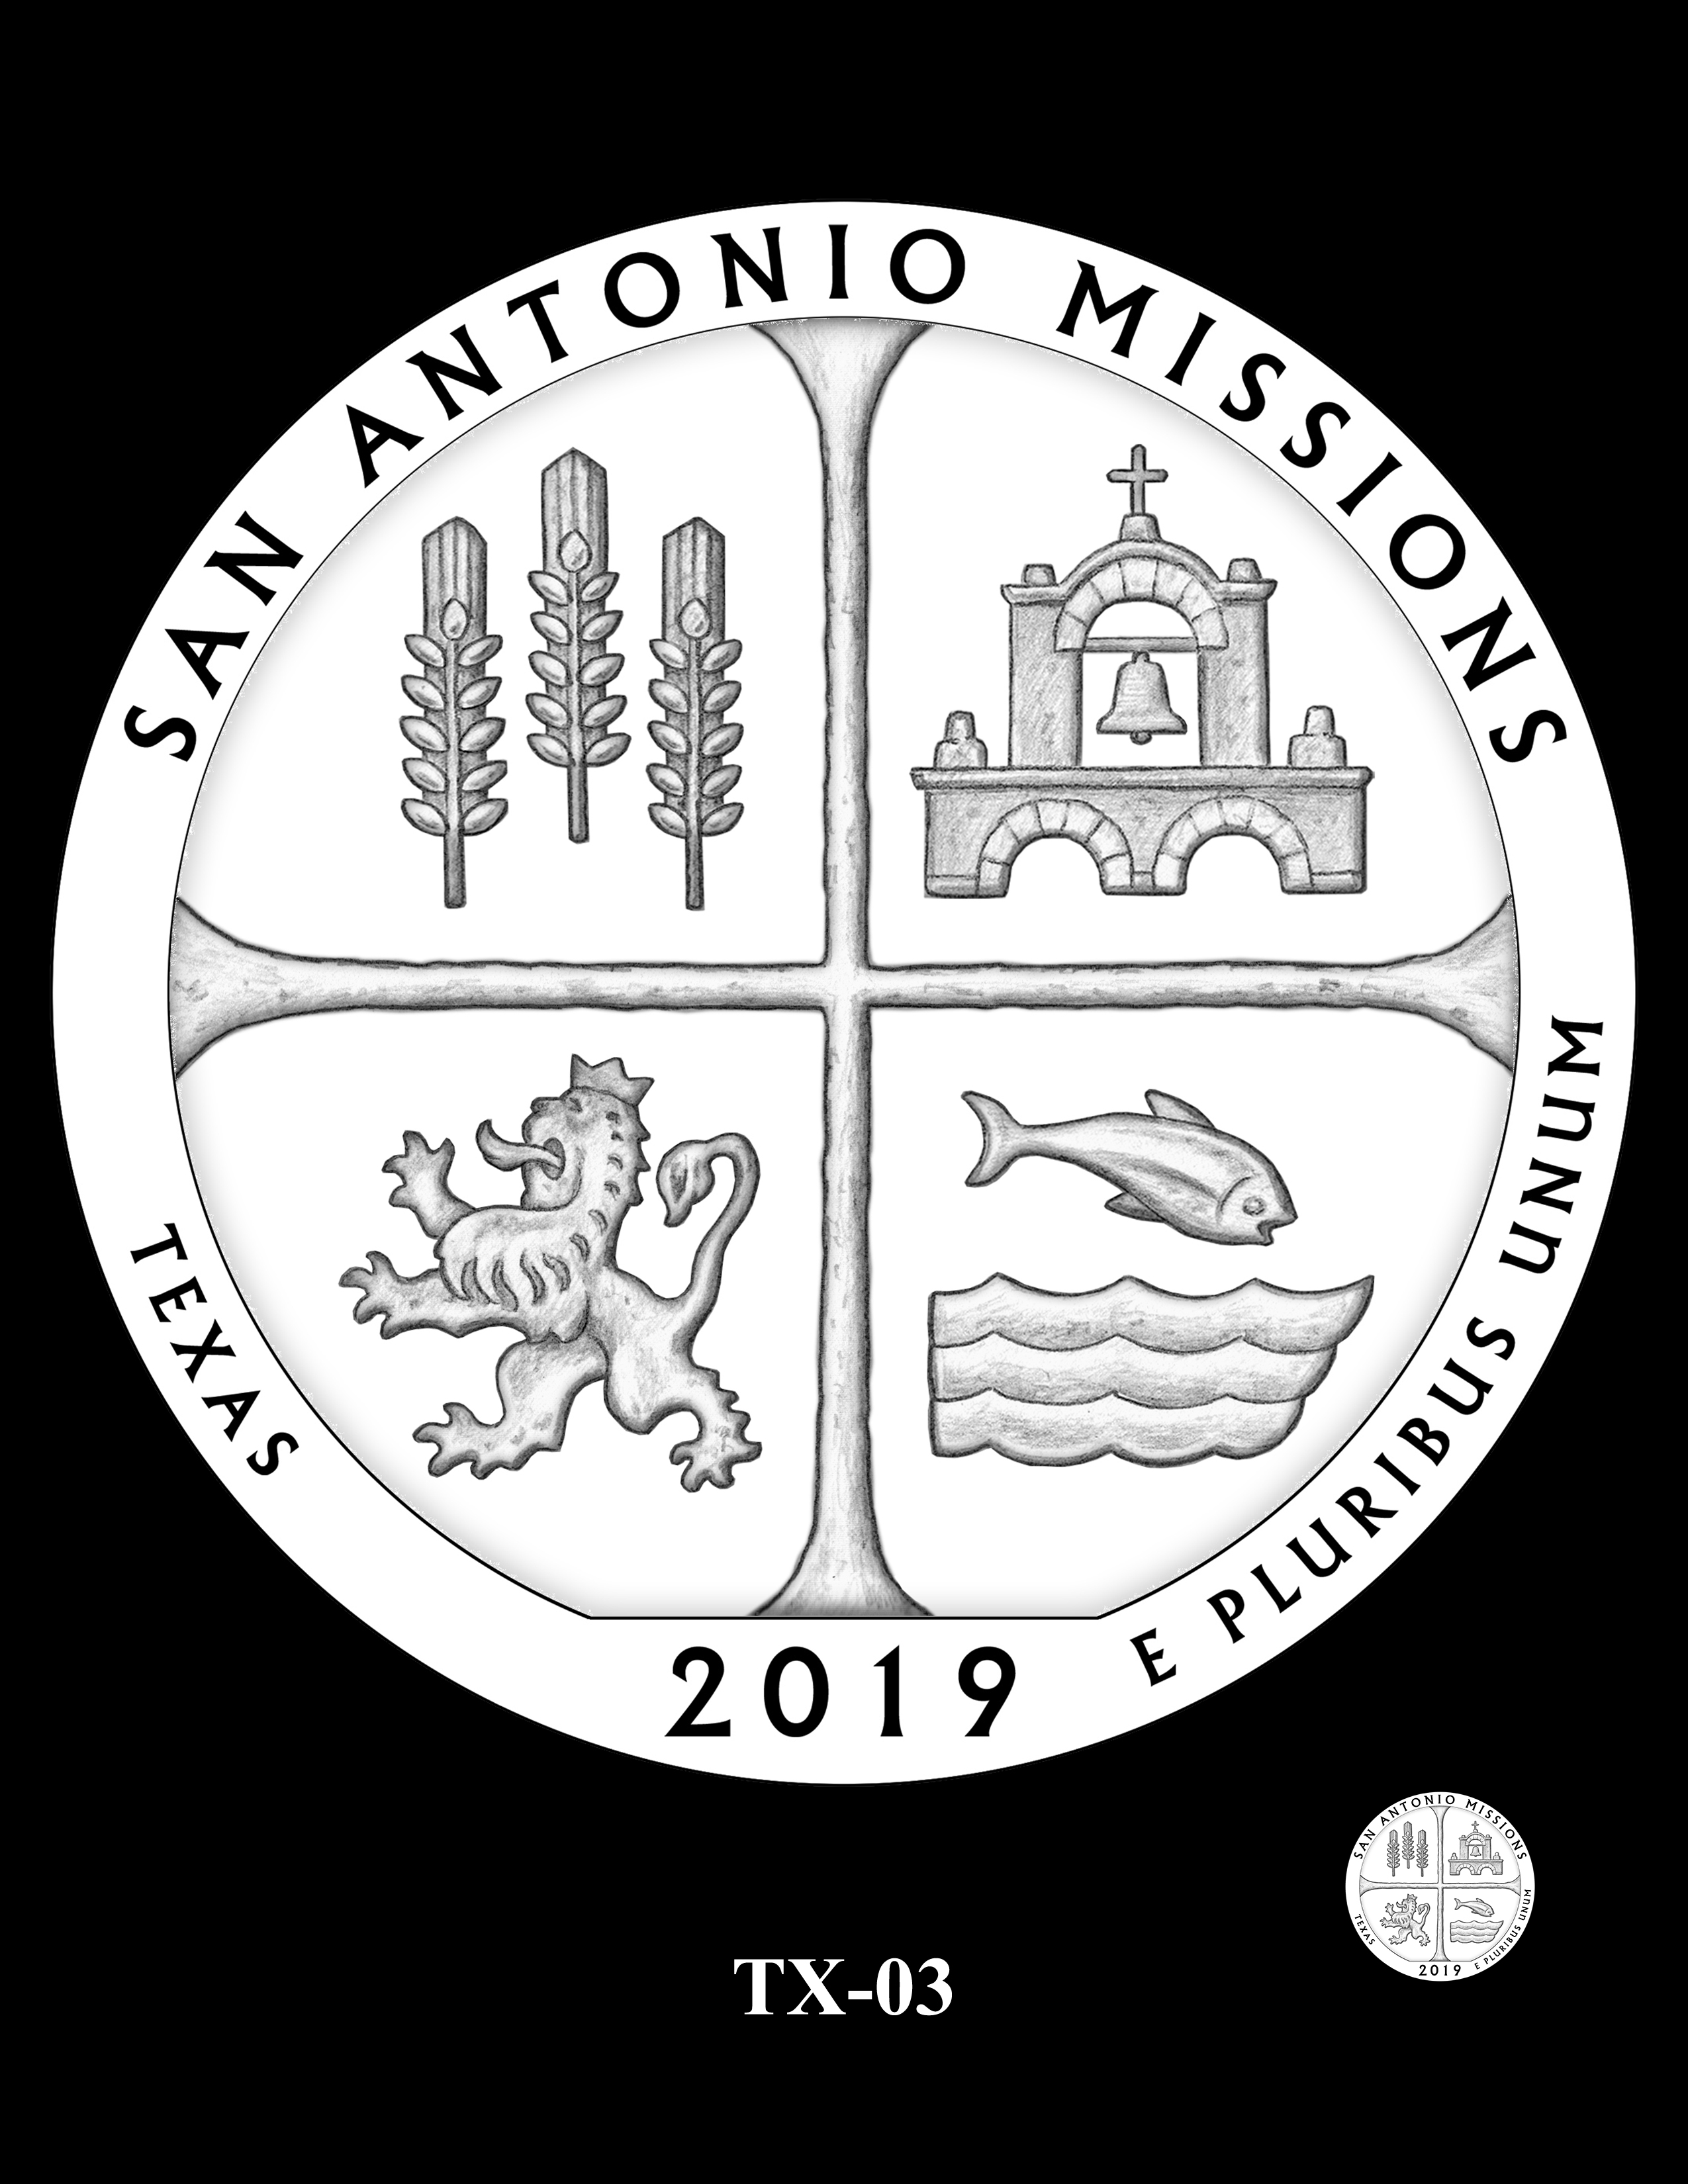 TX-03 -- 2019 America the Beautiful Quarters® Program